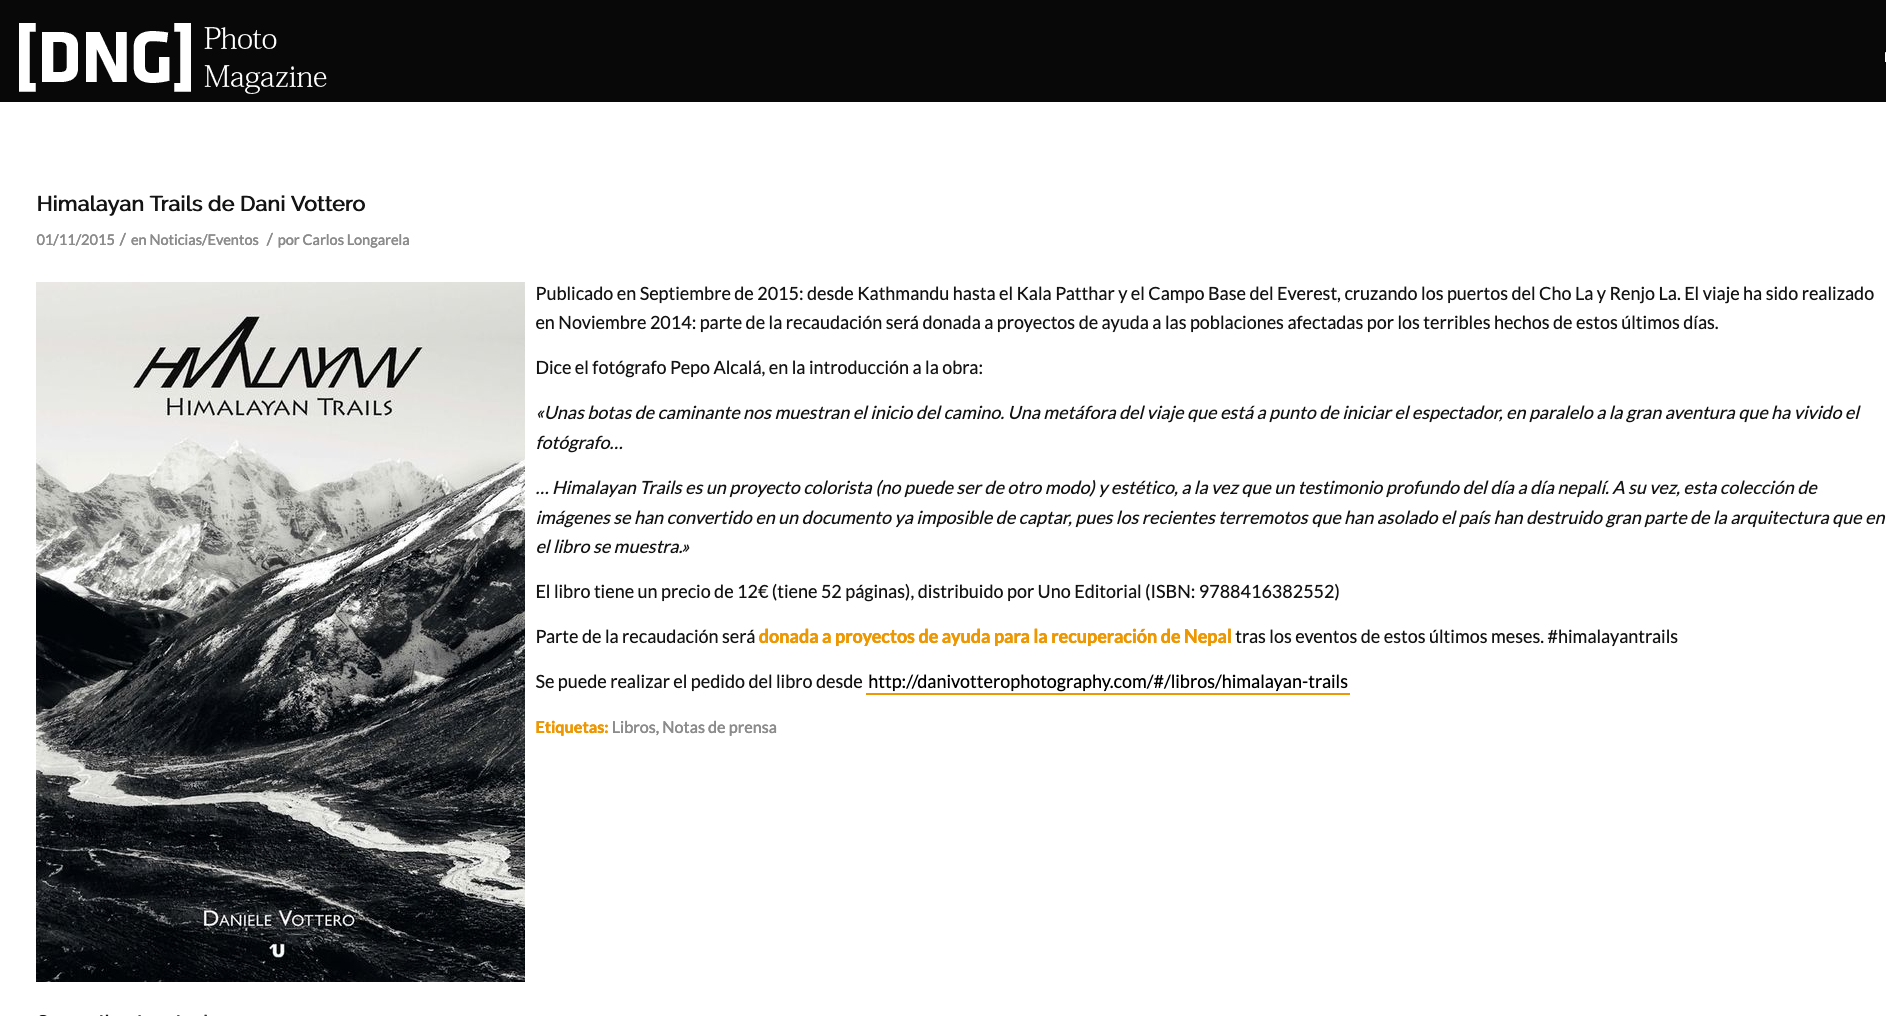 PhotoDNG Magazine, Himalayan Trails | Dani Vottero, fotógrafo de viajes - SCRAPBOOK - Scrapbook | Prensa y Publicaciones | Dani Vottero